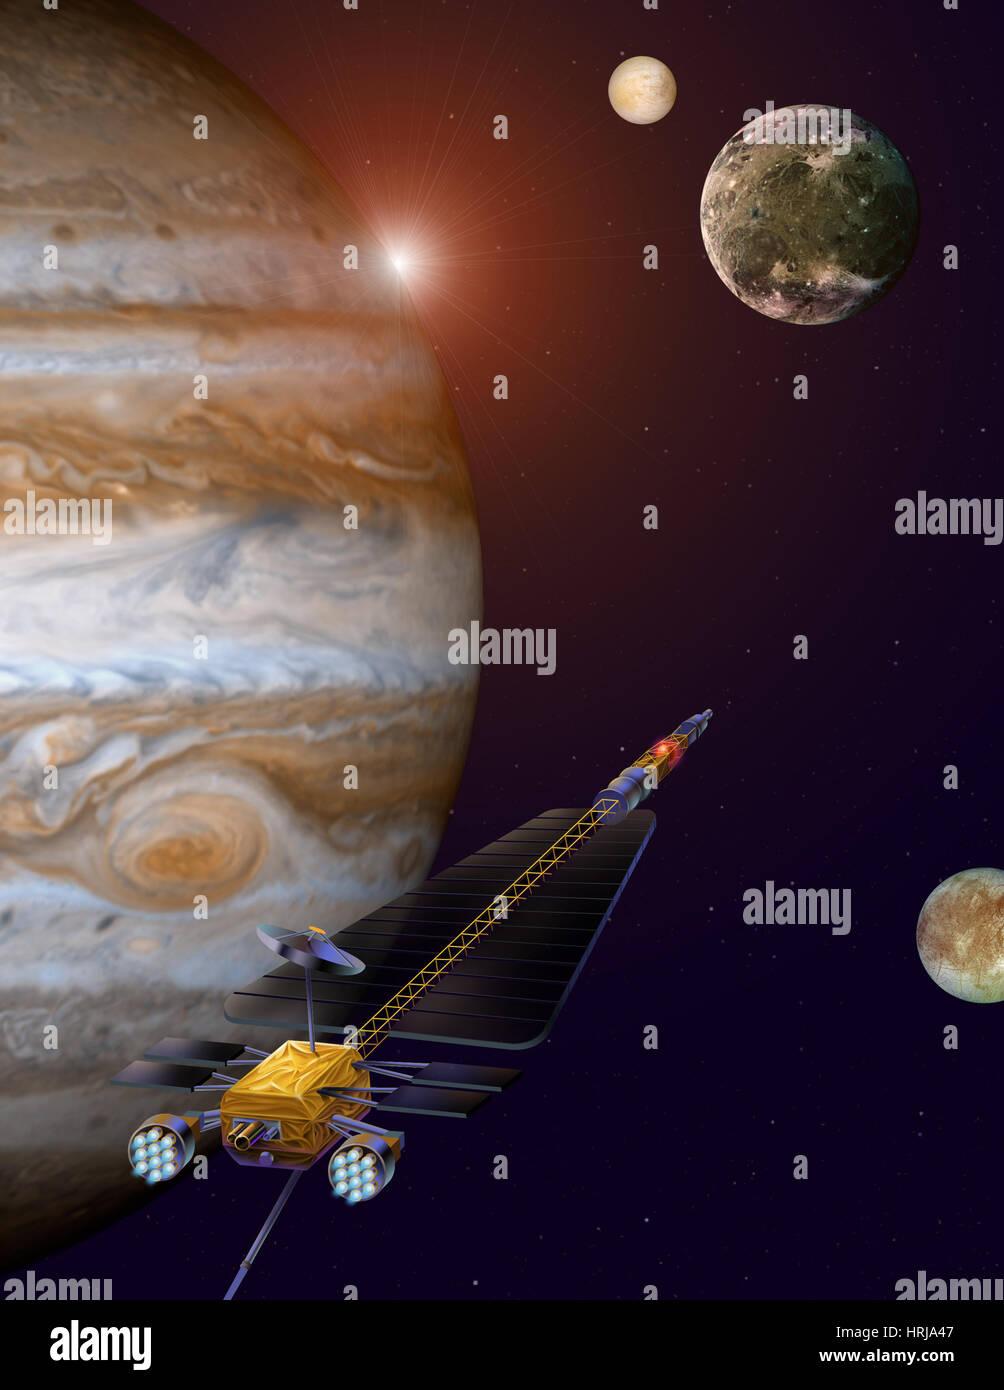 Júpiter Icy Moons Orbiter, Concepto del artista. Imagen De Stock